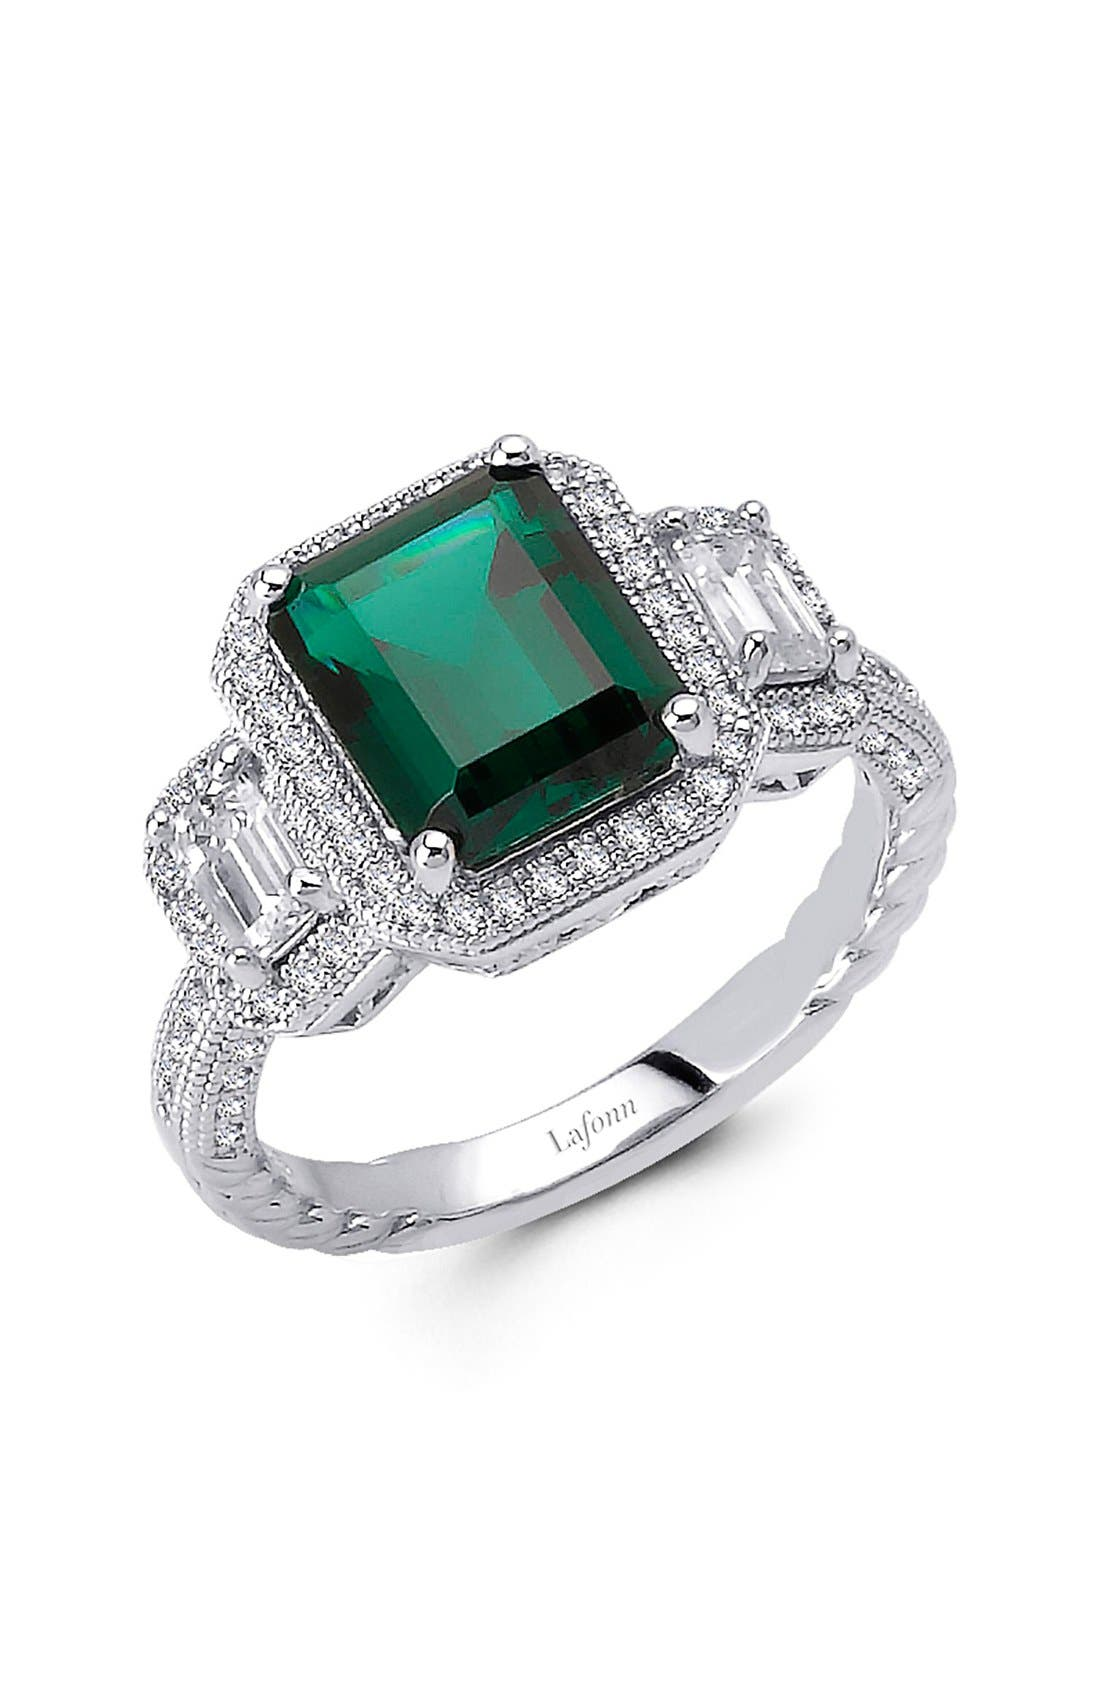 'Lassaire' Three Stone Ring,                             Main thumbnail 1, color,                             040